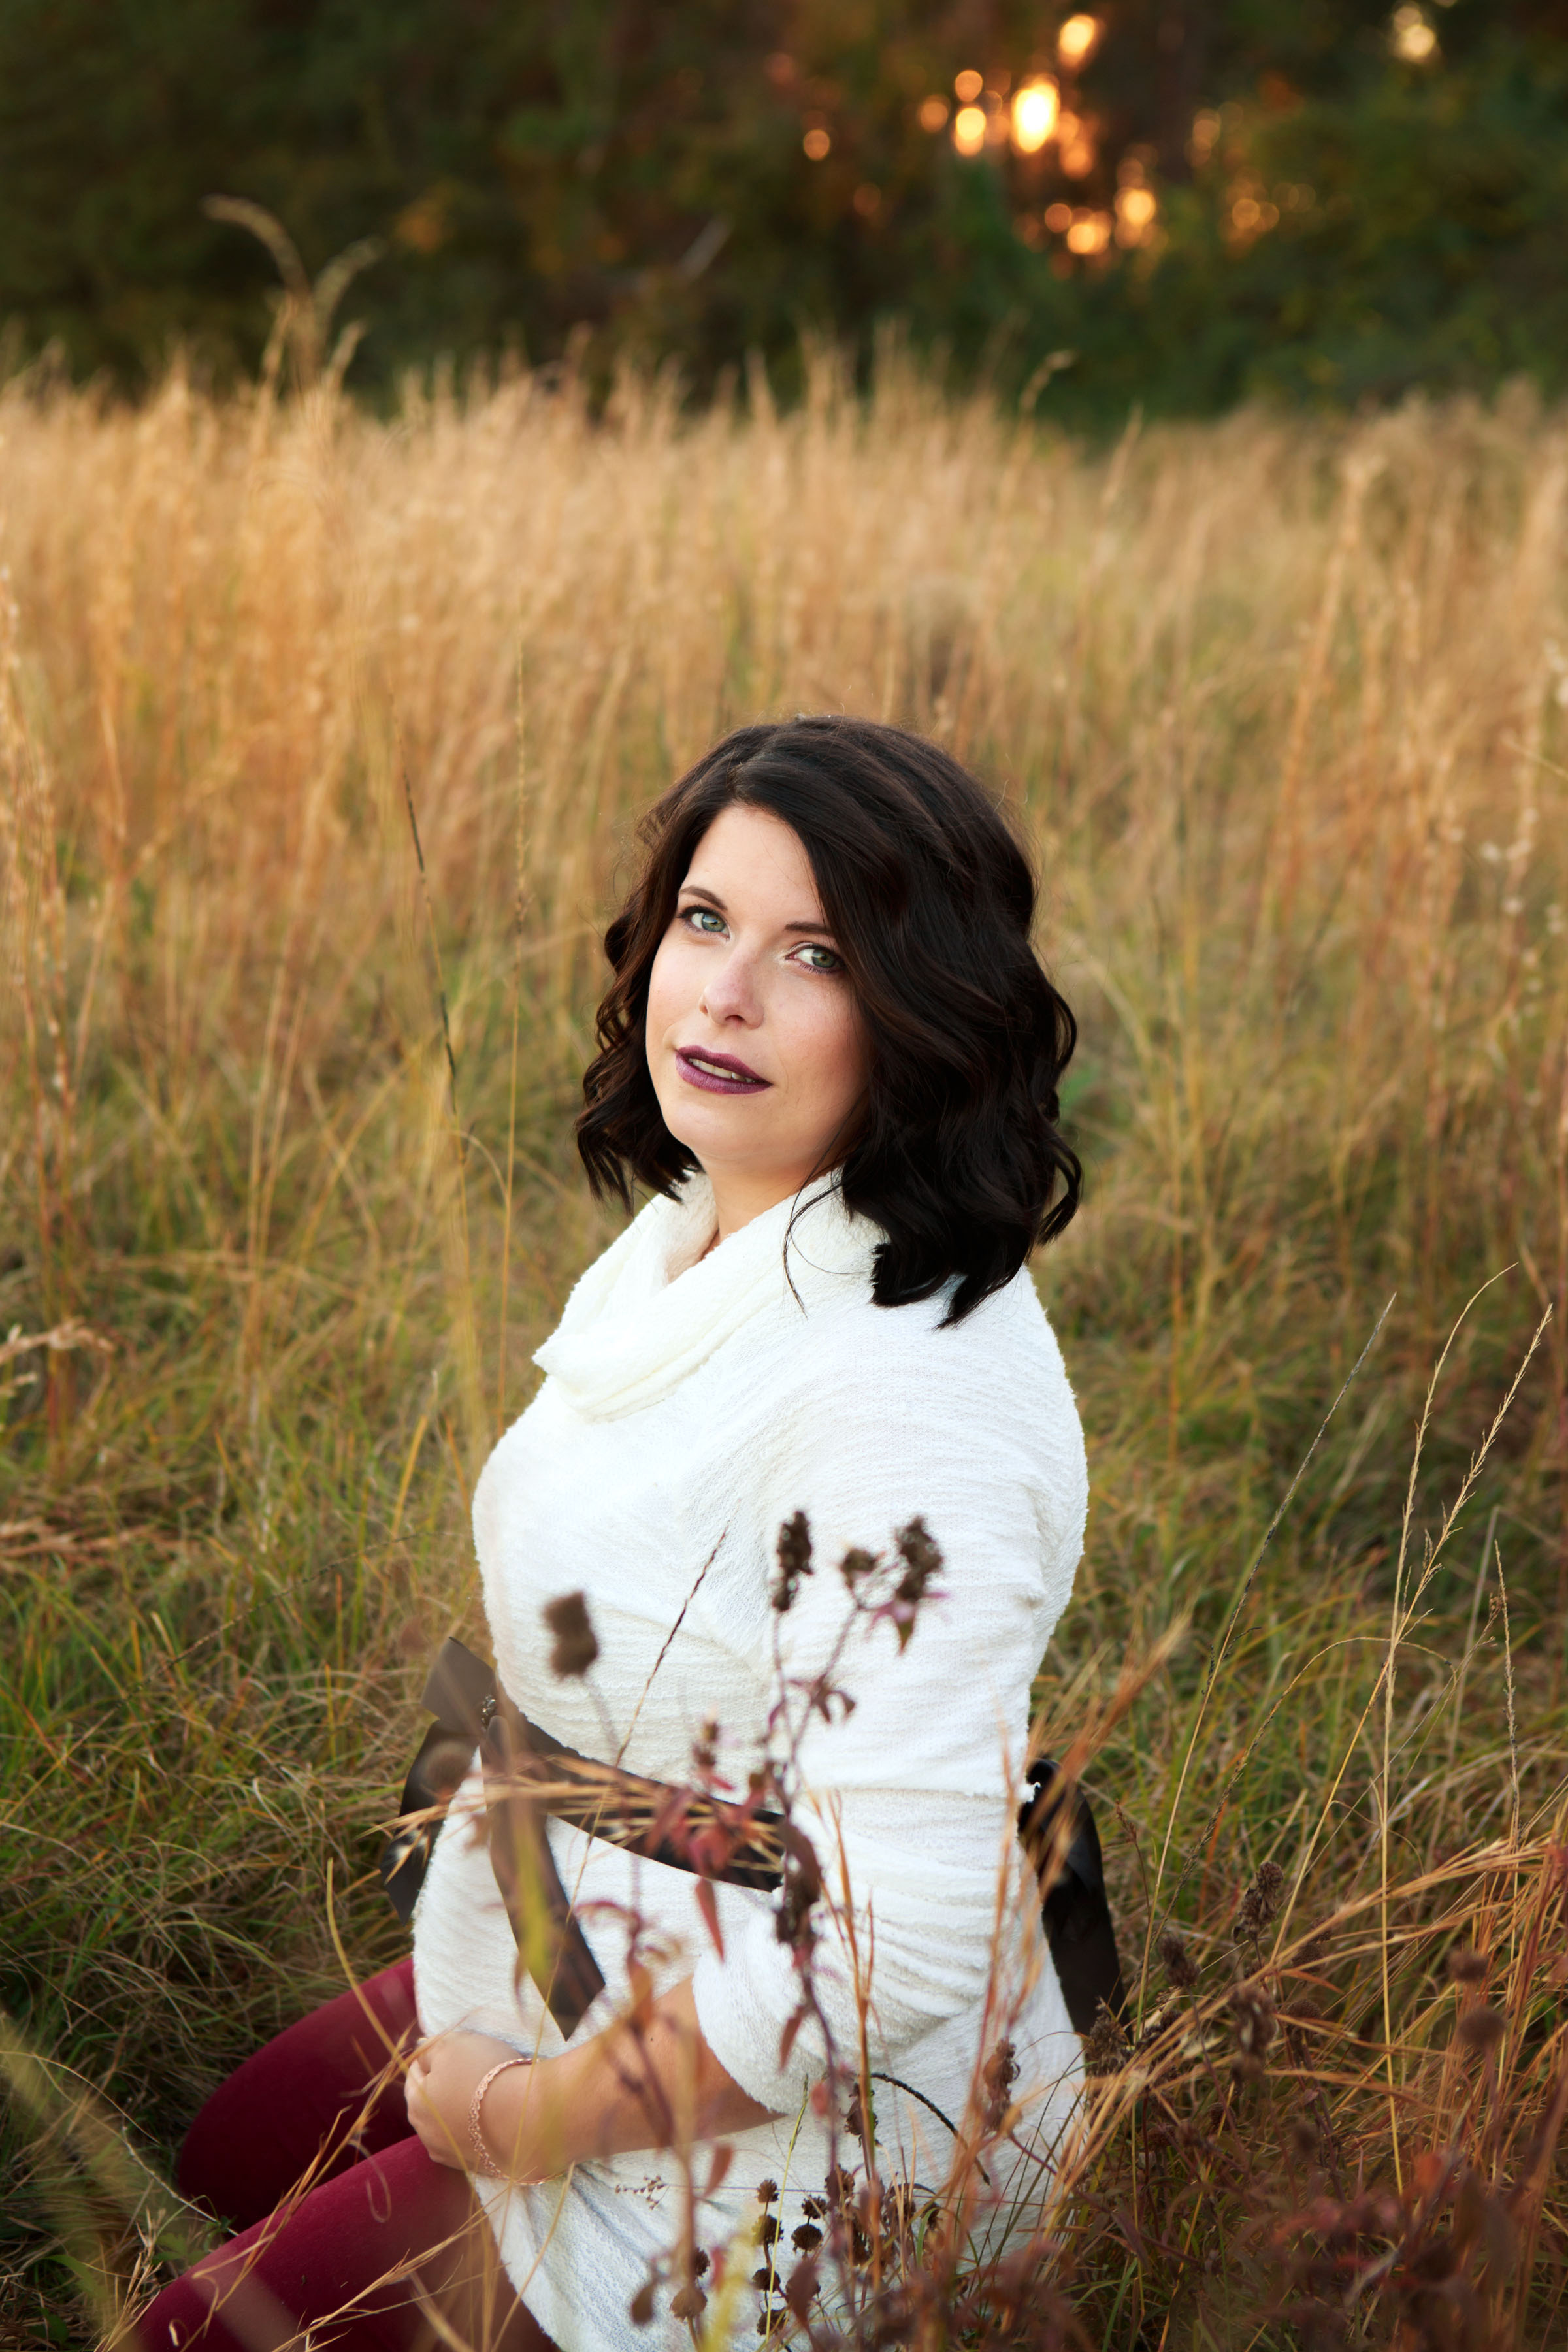 Maryland Photographer │ Tiffany Abruzzo Photography